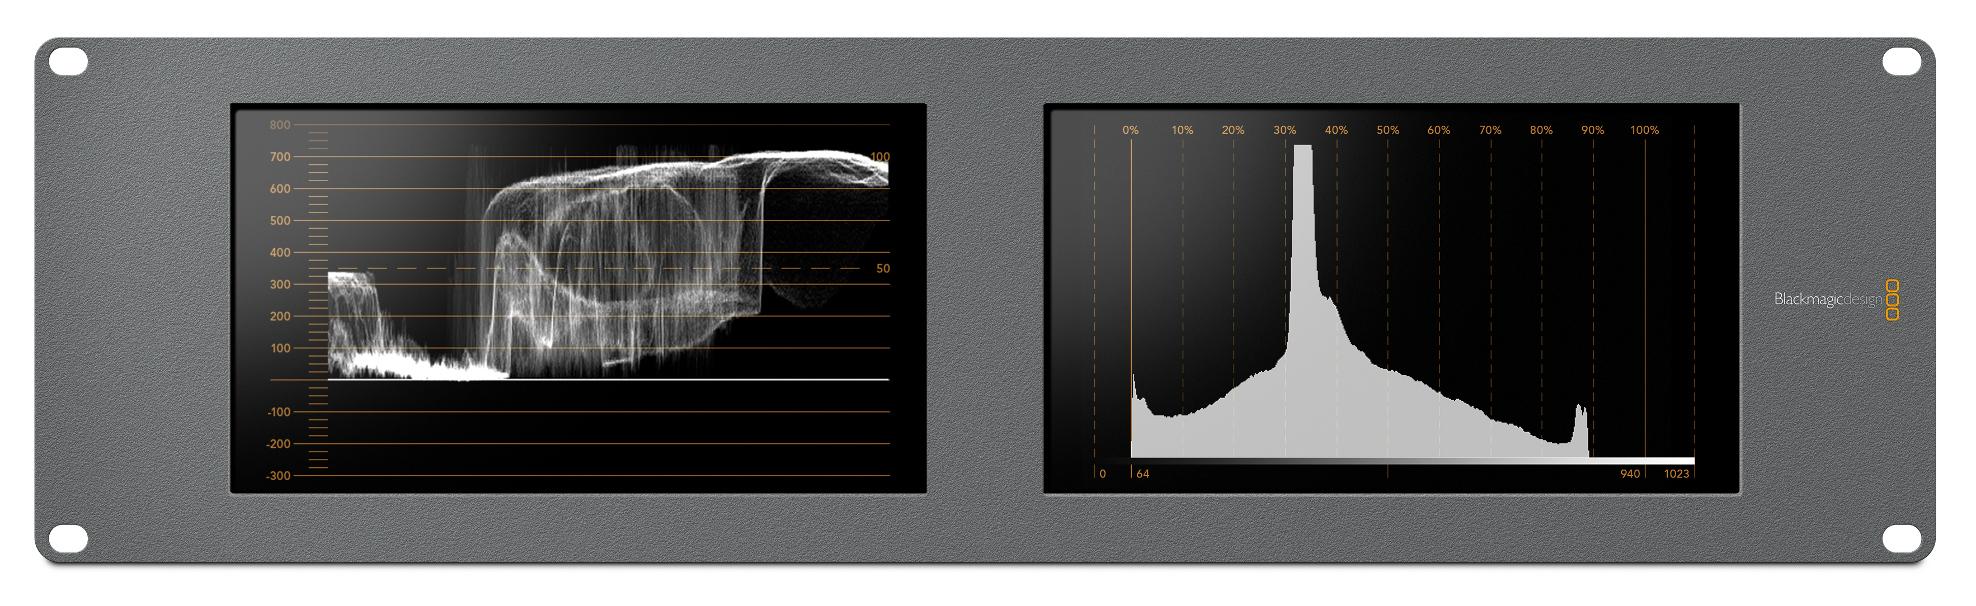 "Dual 8"" 3RU SDI/HD-SDI/3G-SDI/6G-SDI 4K Monitors with Built in Scopes"